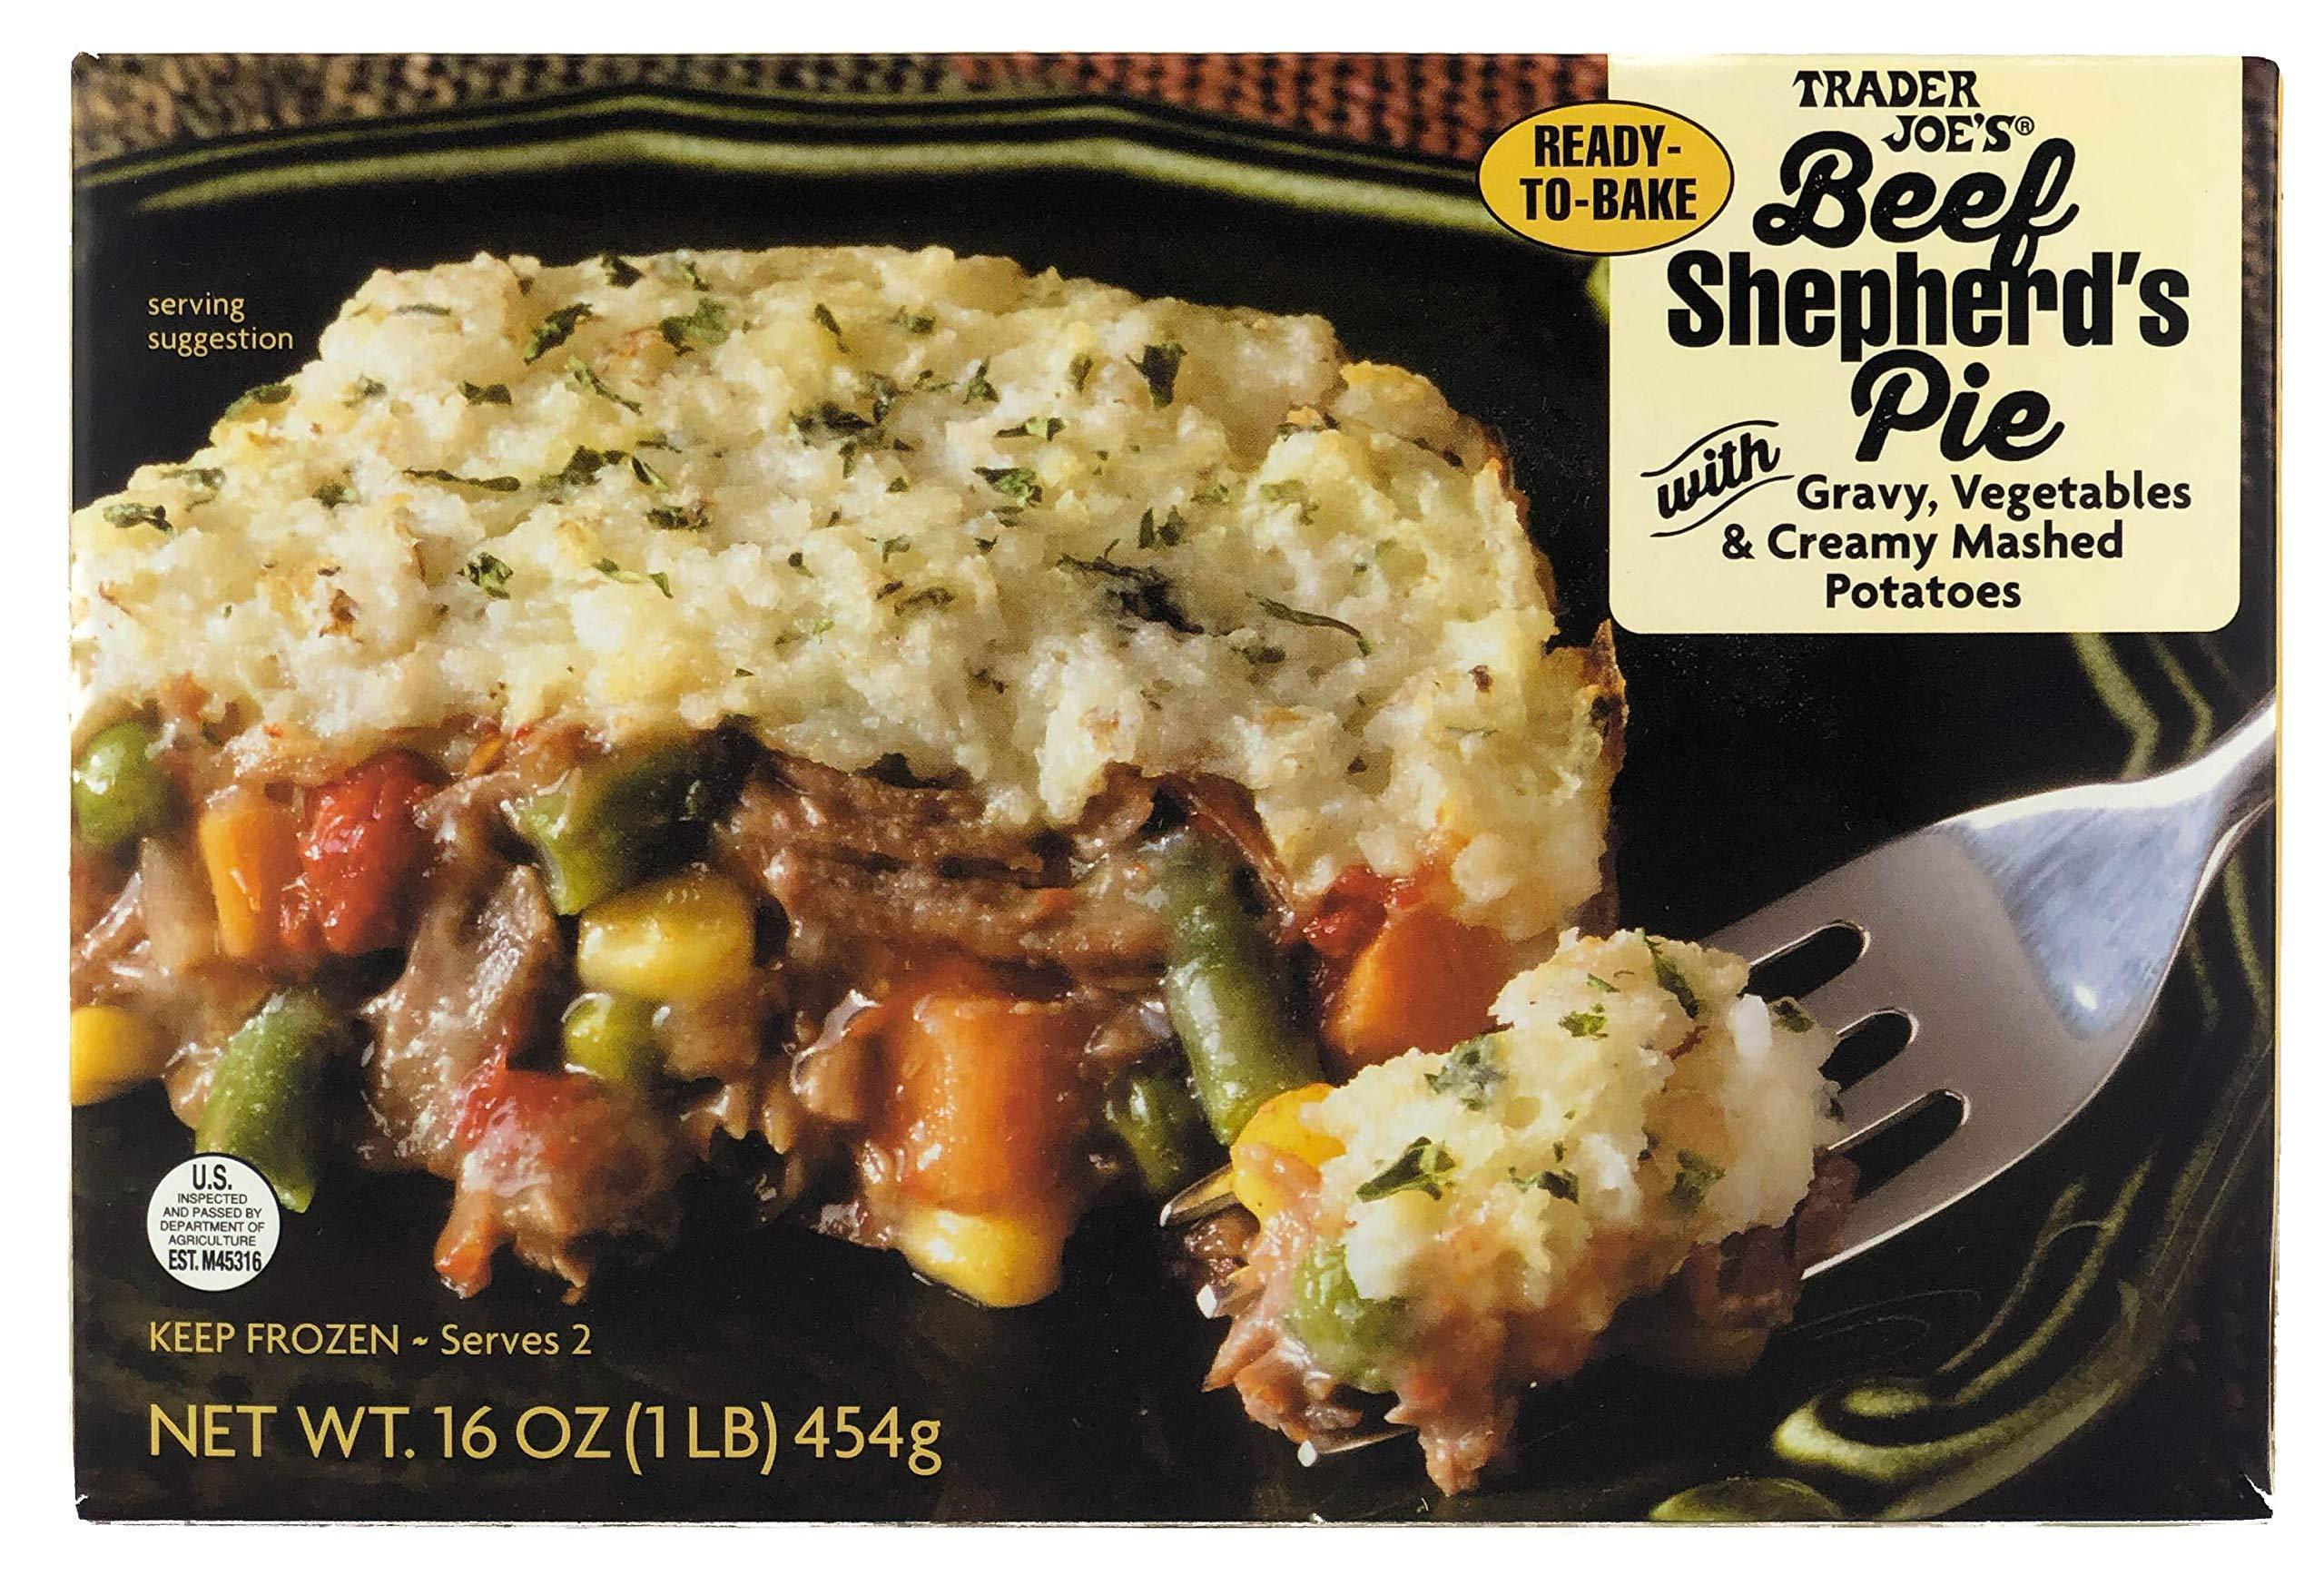 Trader Joe's Beef Shepherd's Pie with Gravy, Vegetables, Creamy Mashed Potatoes (4 Pack)